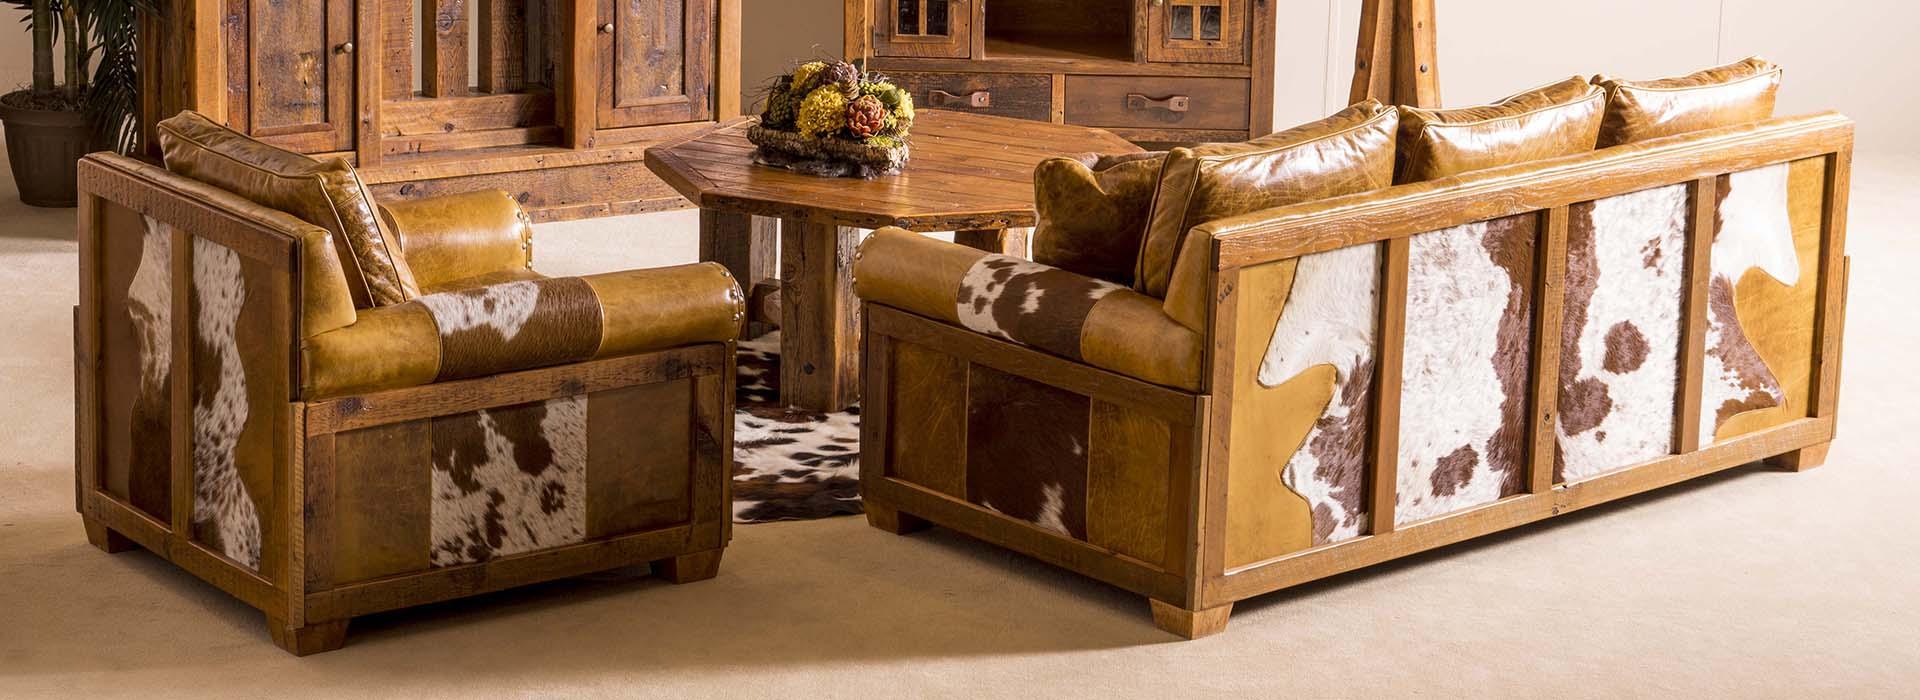 The Refuge Furniture & Decor | 20% Off Site Wide | Tulsa OK